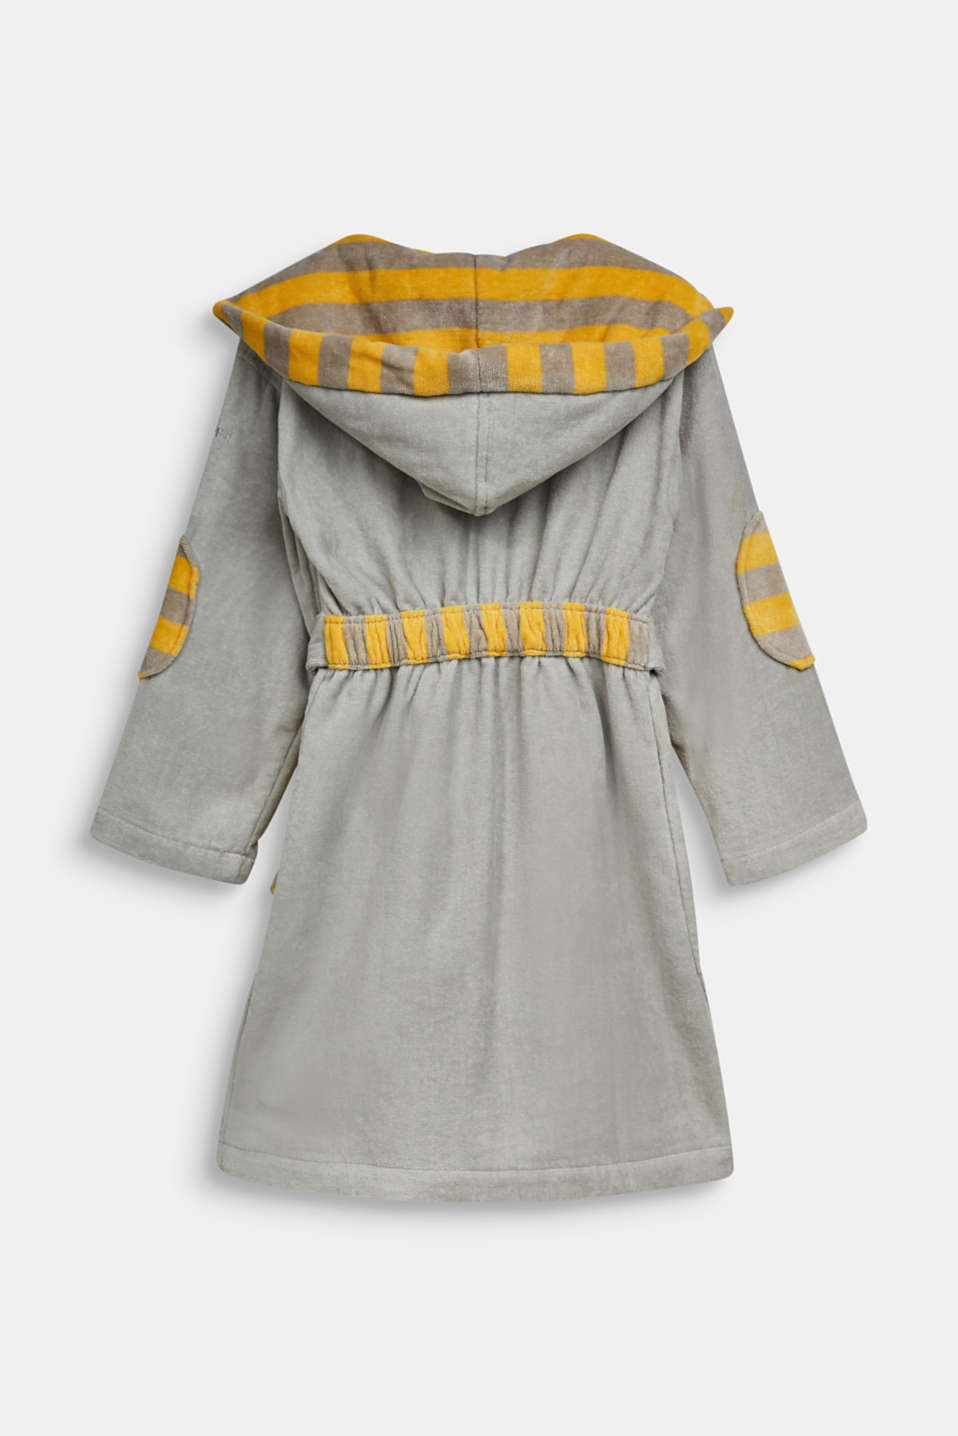 Children's bathrobe in 100% cotton, STONE, detail image number 1